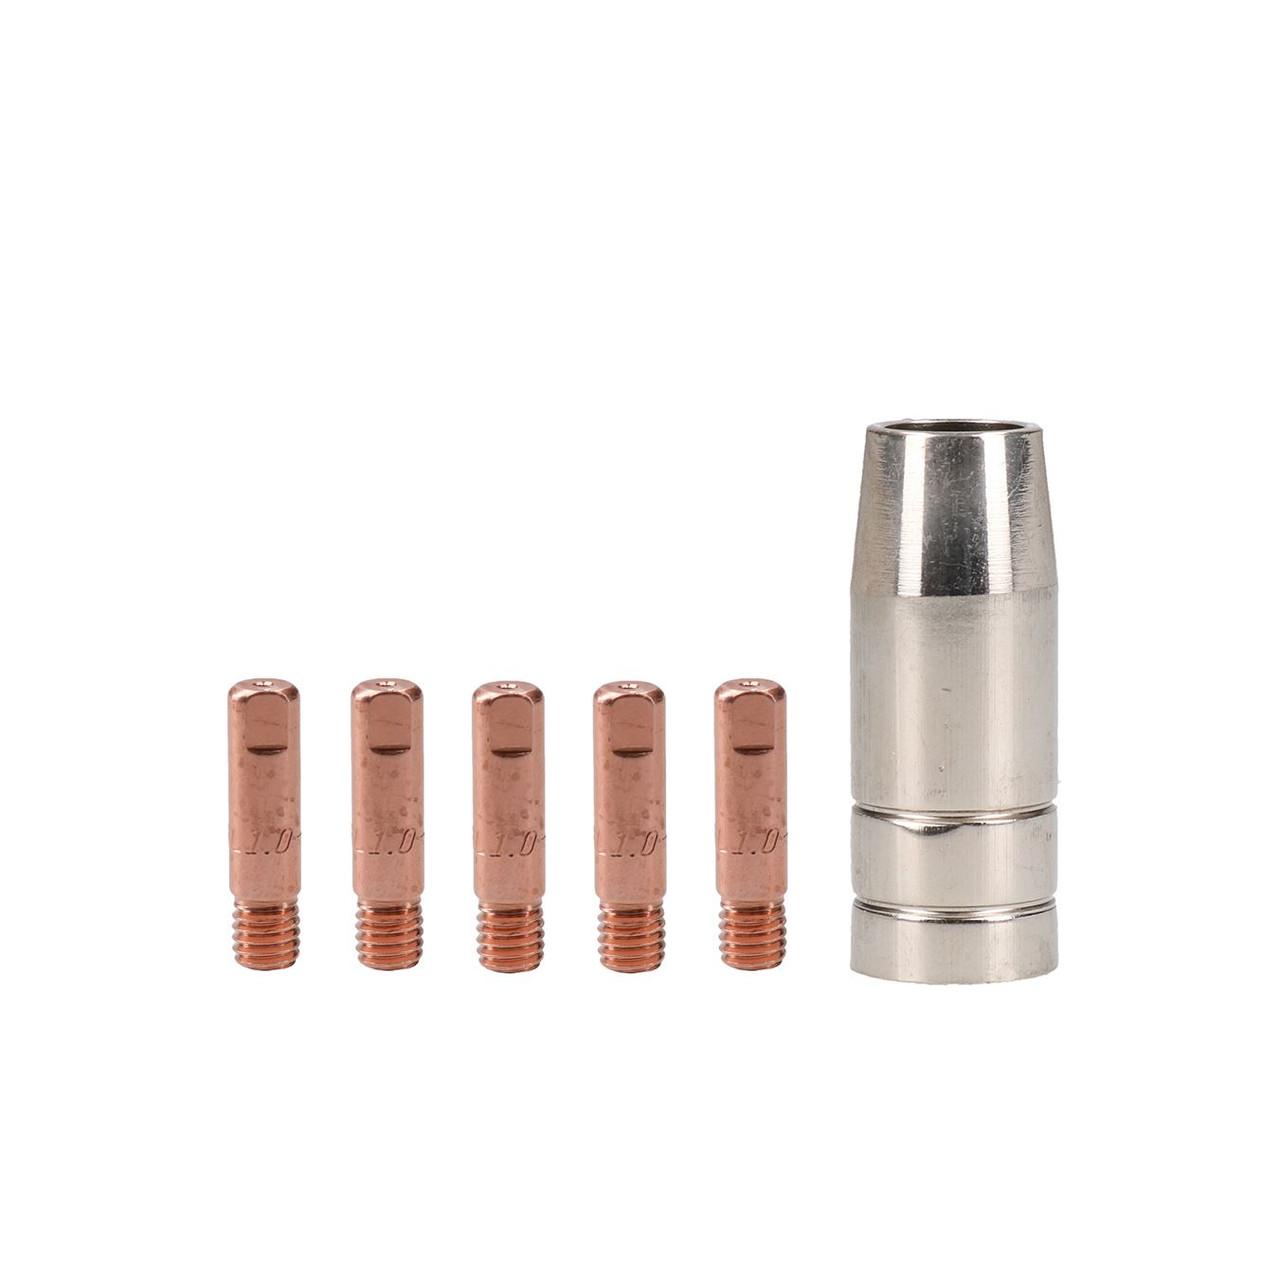 Snap On 130 1x Shroud Nozzle /& 25x 1.0mm Welding Tips Cebora 130 /& 110